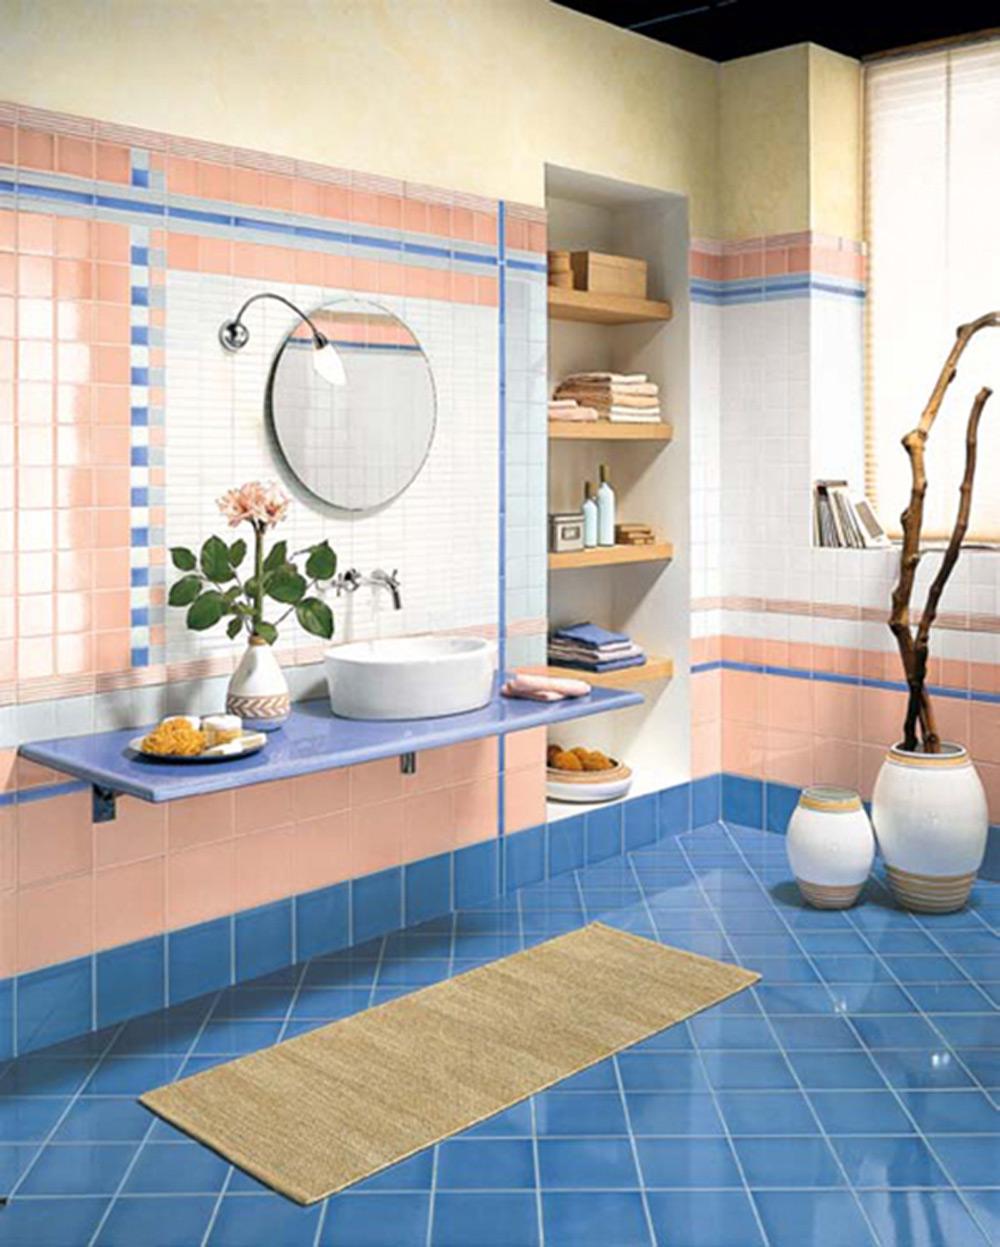 Uređenje kupatila - vintage keramičke pločice